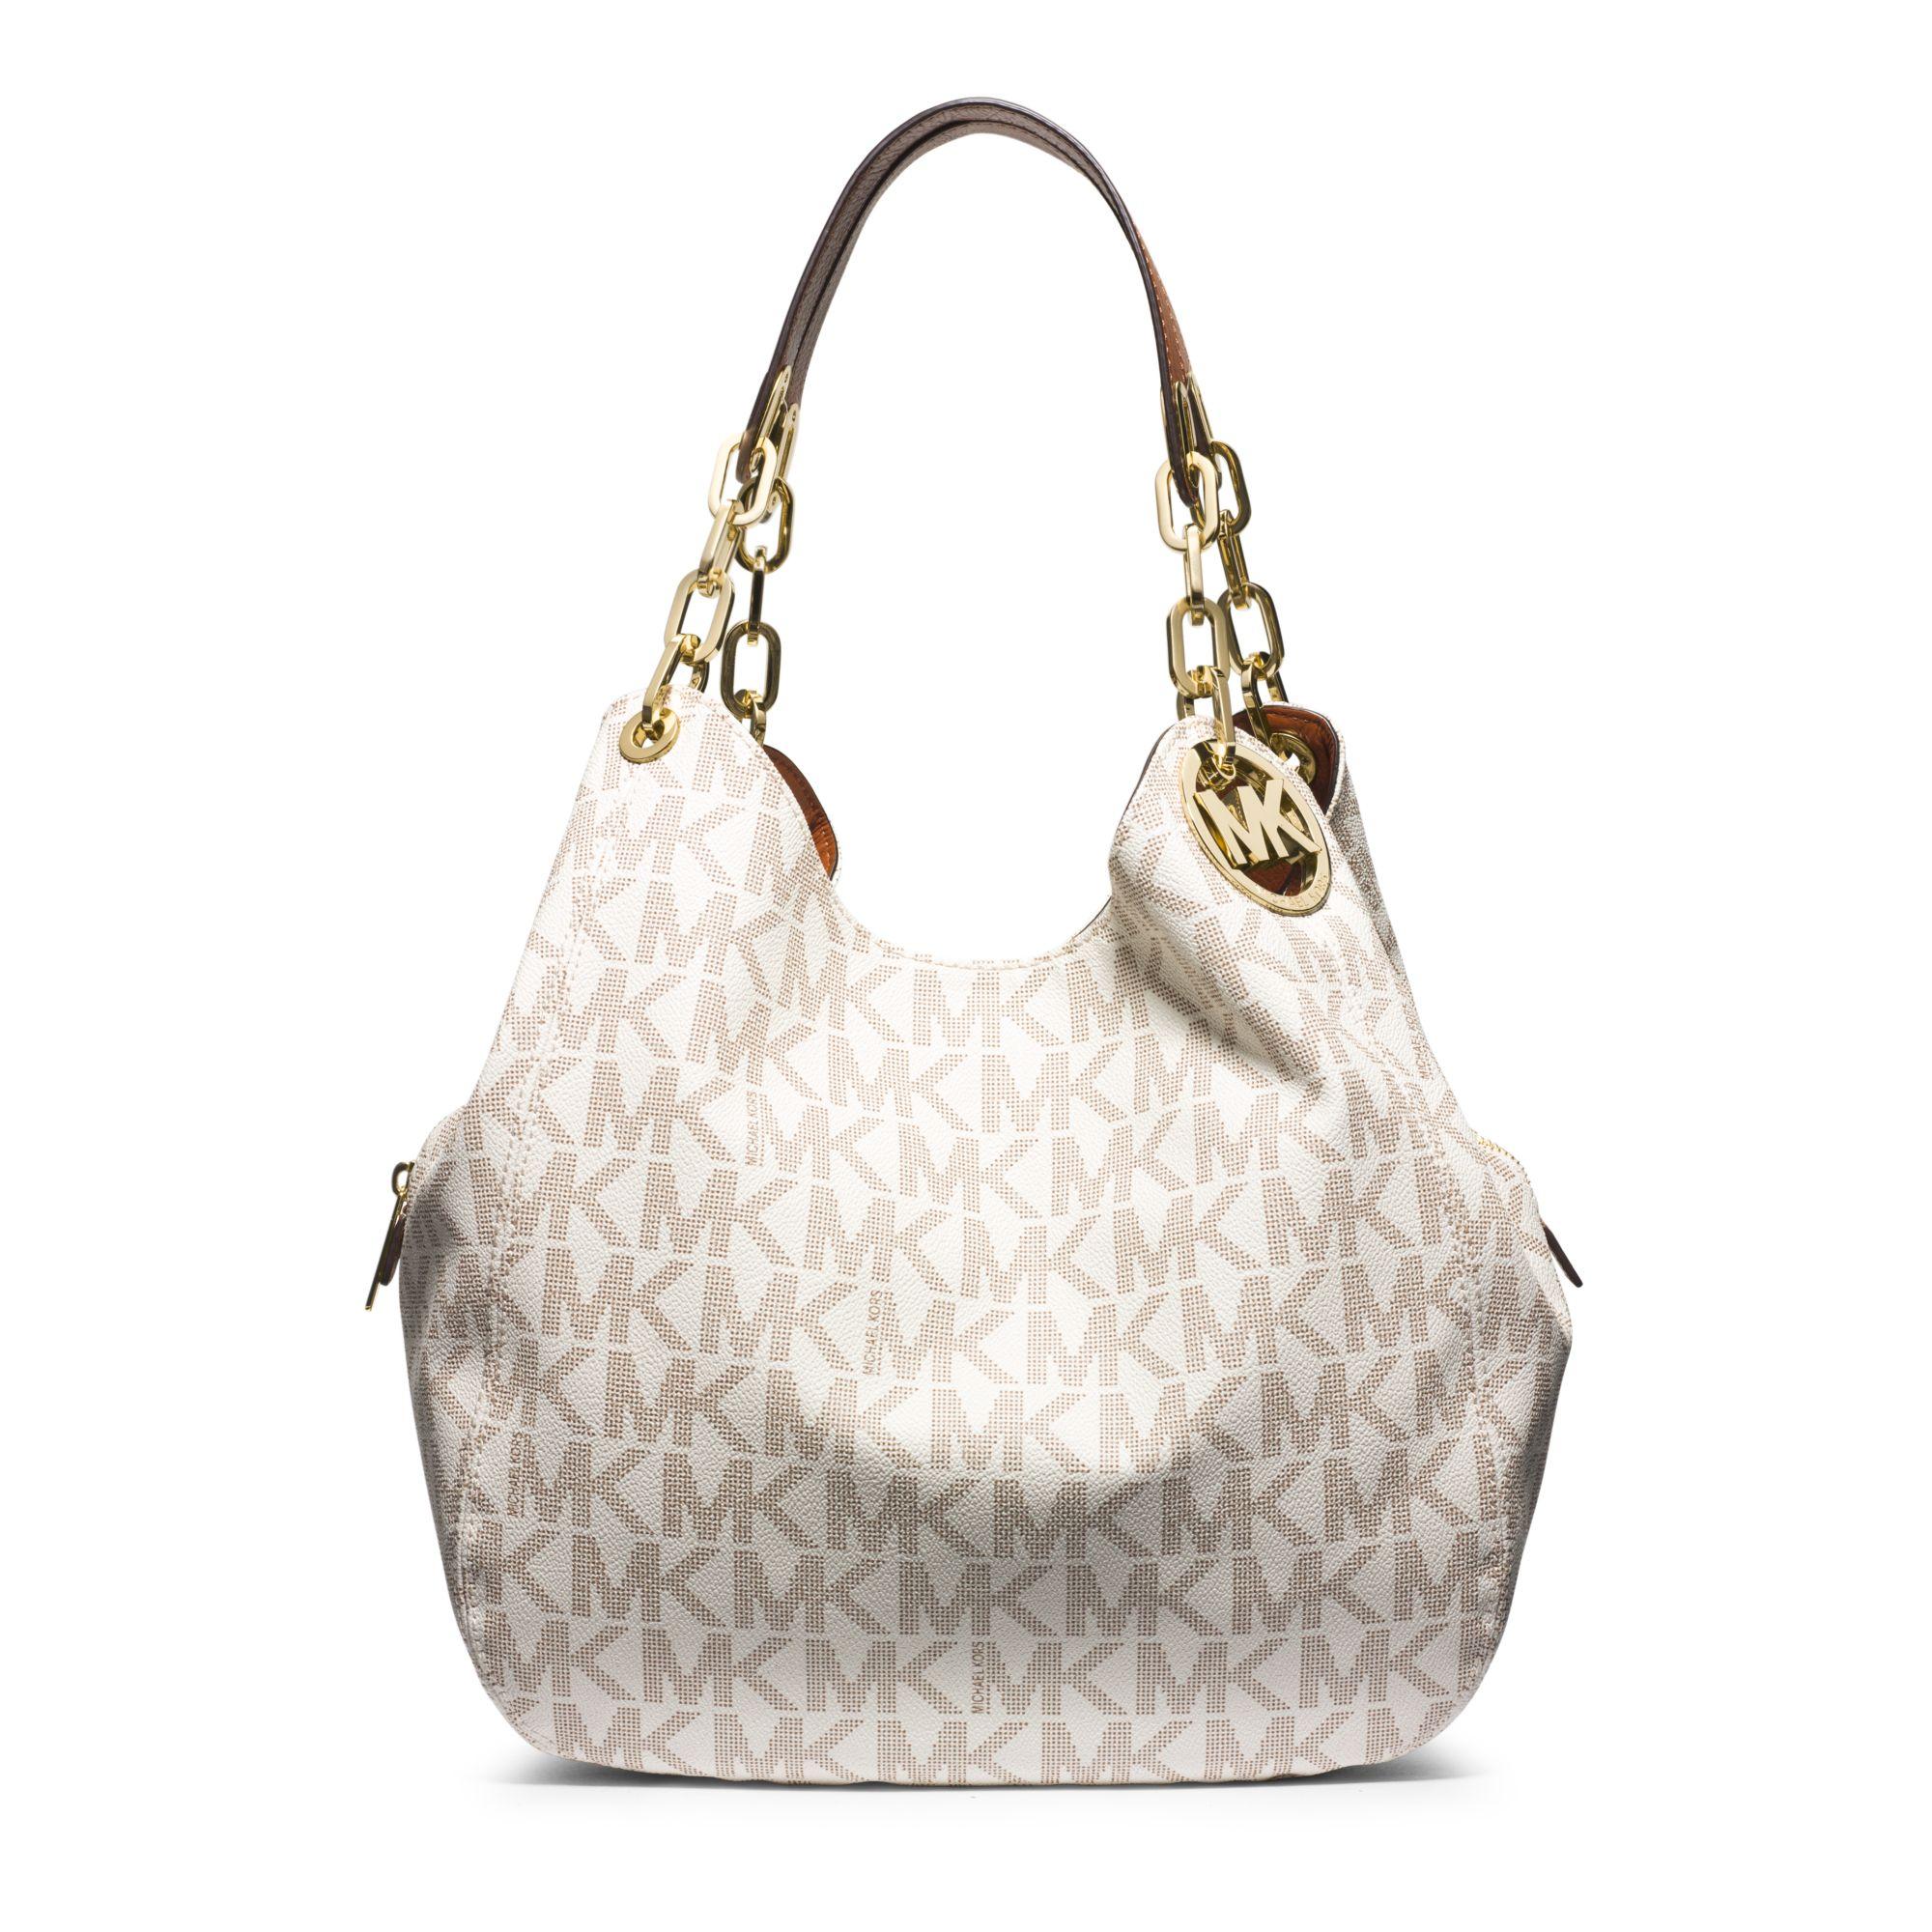 7a12a49134d1 Michael Kors Fulton Large Logo Shoulder Bag in White - Lyst